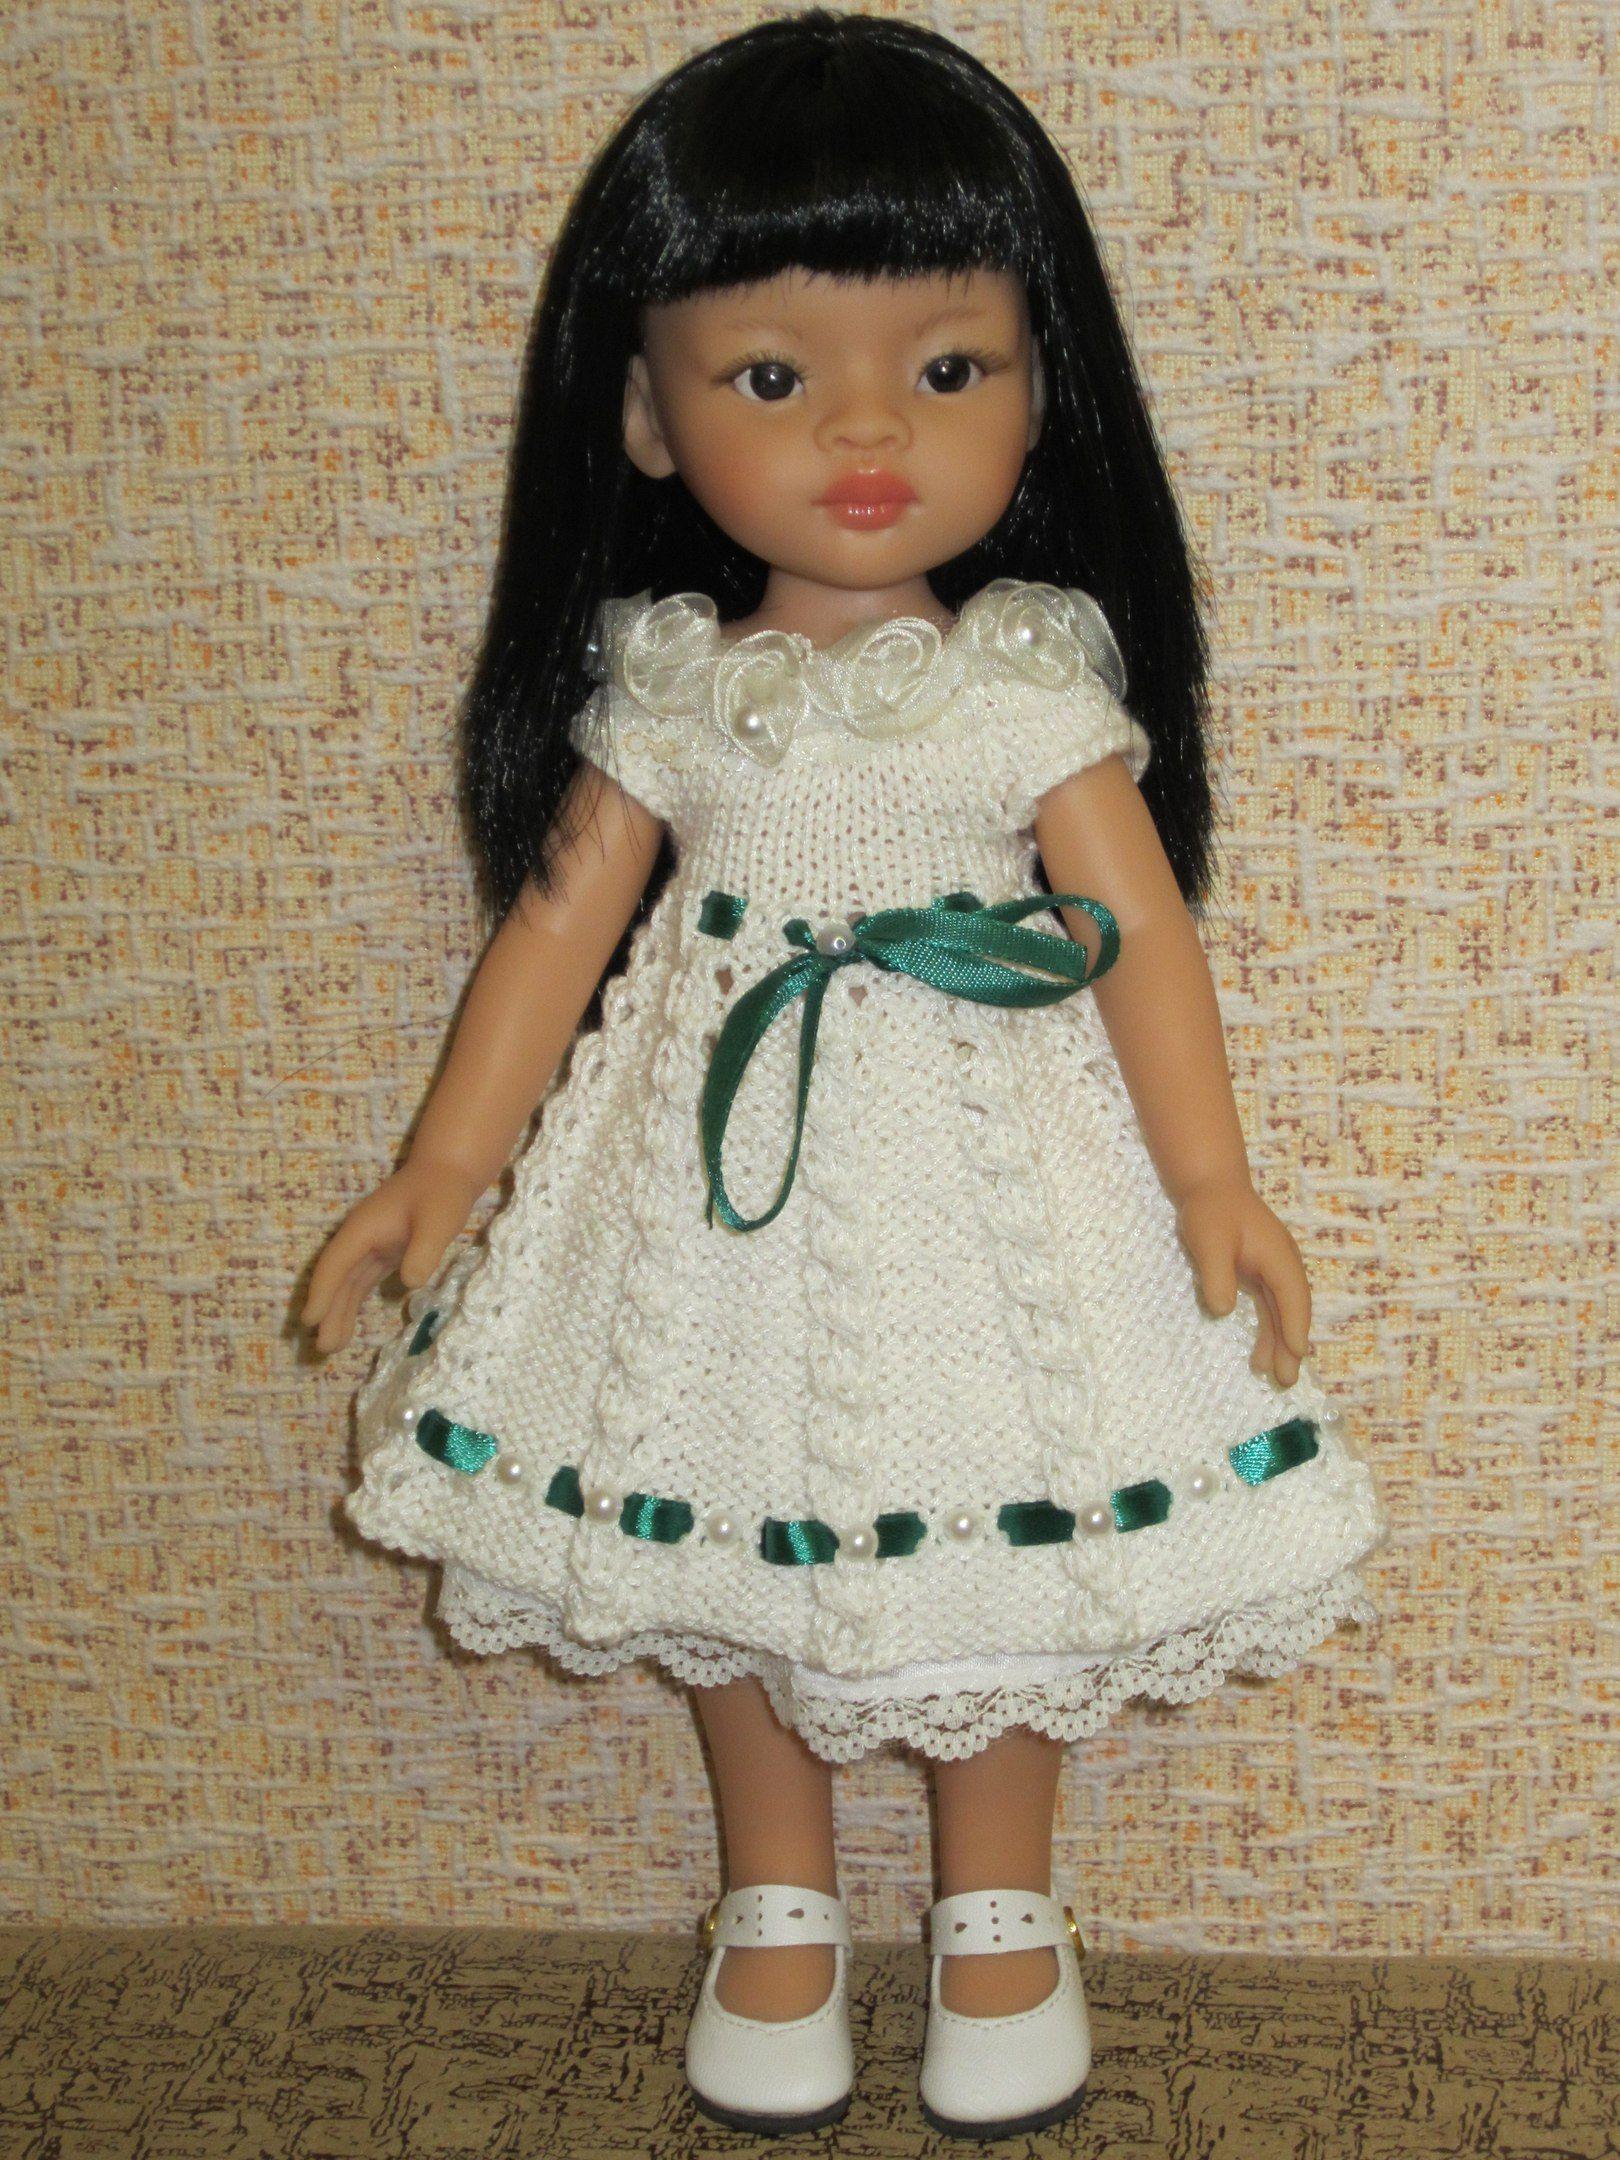 Испанские куклы Paola Reina   Одежда для кукол, Мода, Одежда